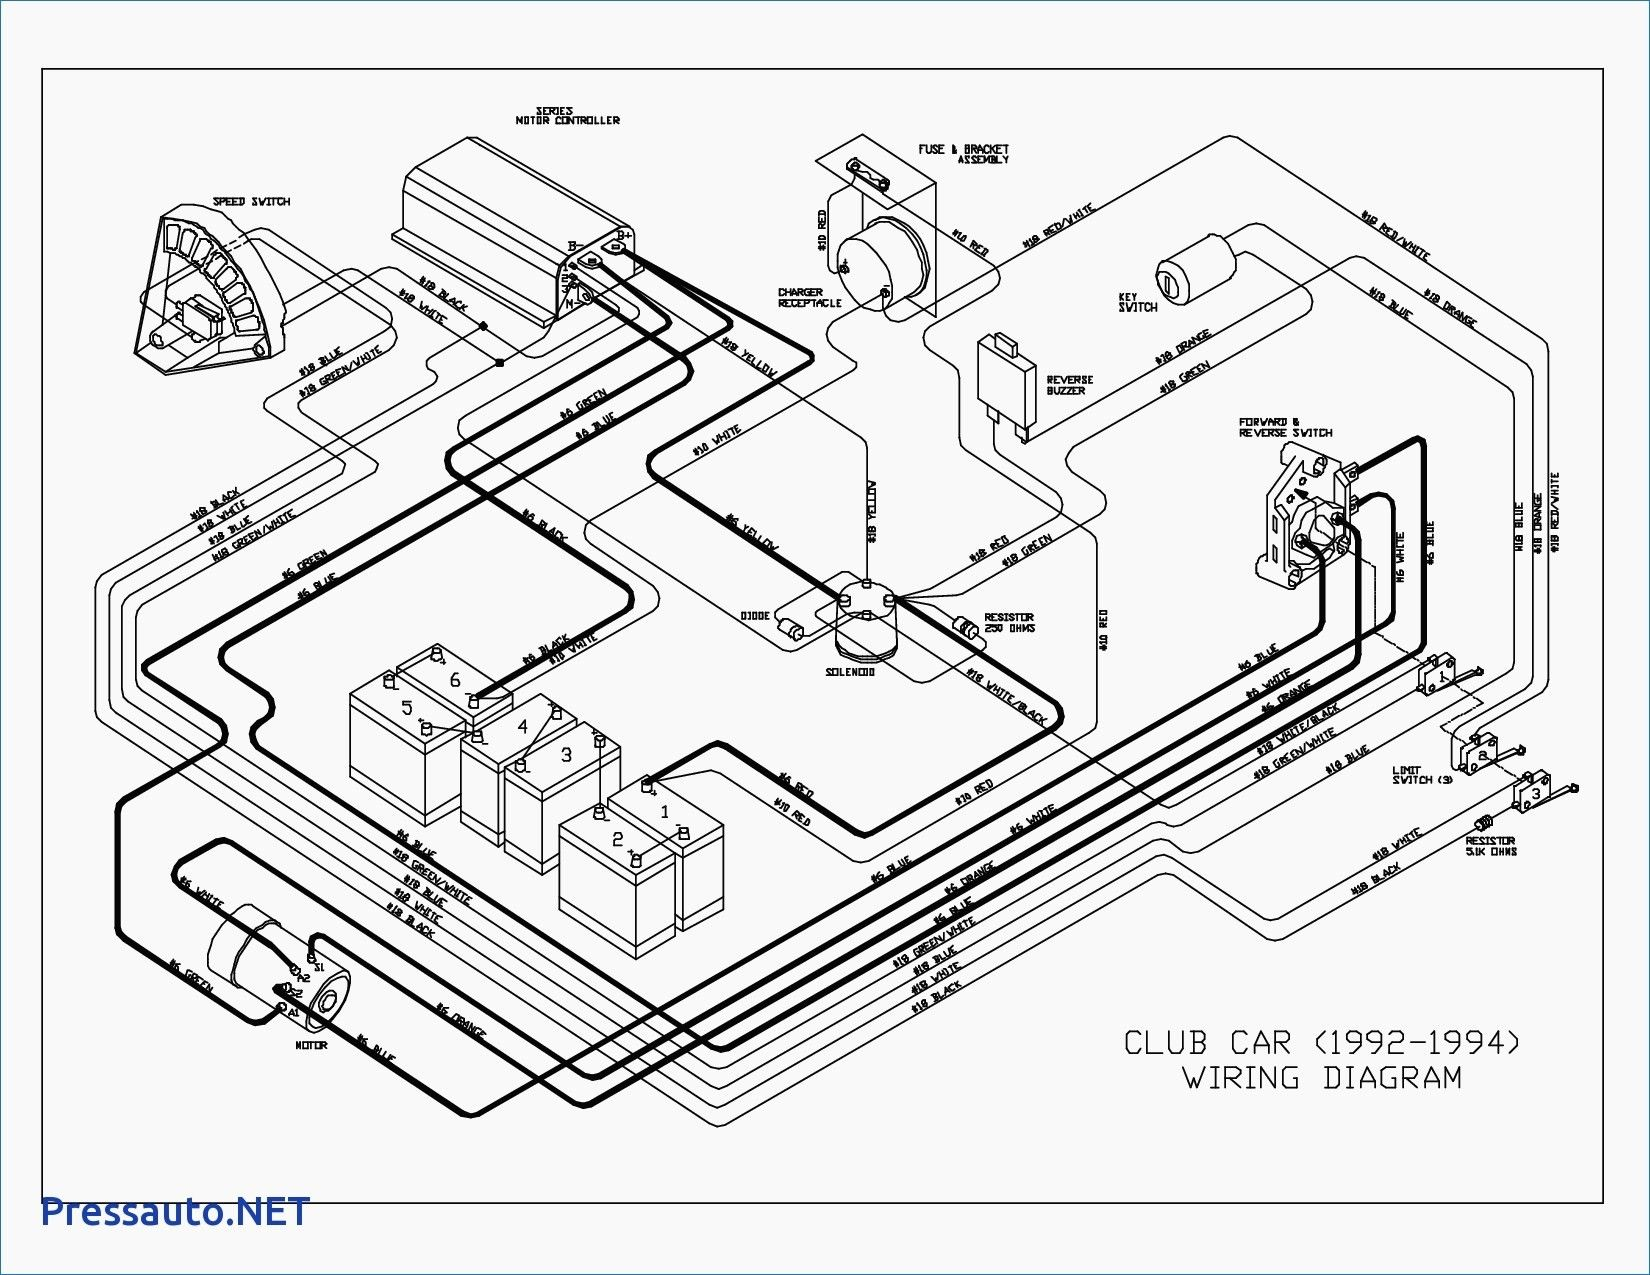 Unique Wiring Diagrams Automobiles Diagram Wiringdiagram Diagramming Diagramm Visuals Visualisation Club Car Golf Cart Electric Golf Cart Ezgo Golf Cart